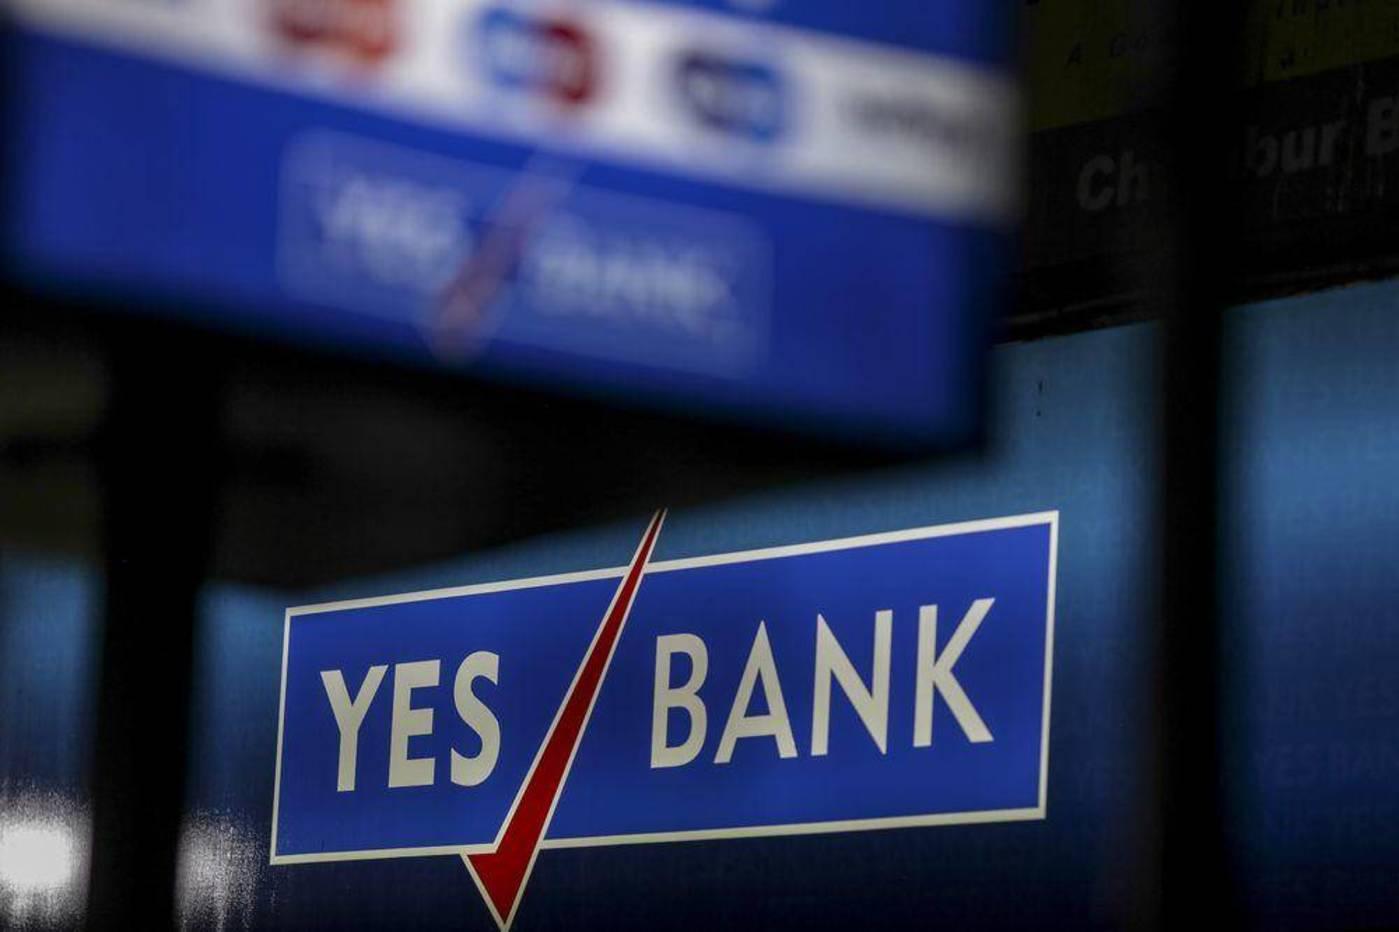 印度民营银行Yes Bank